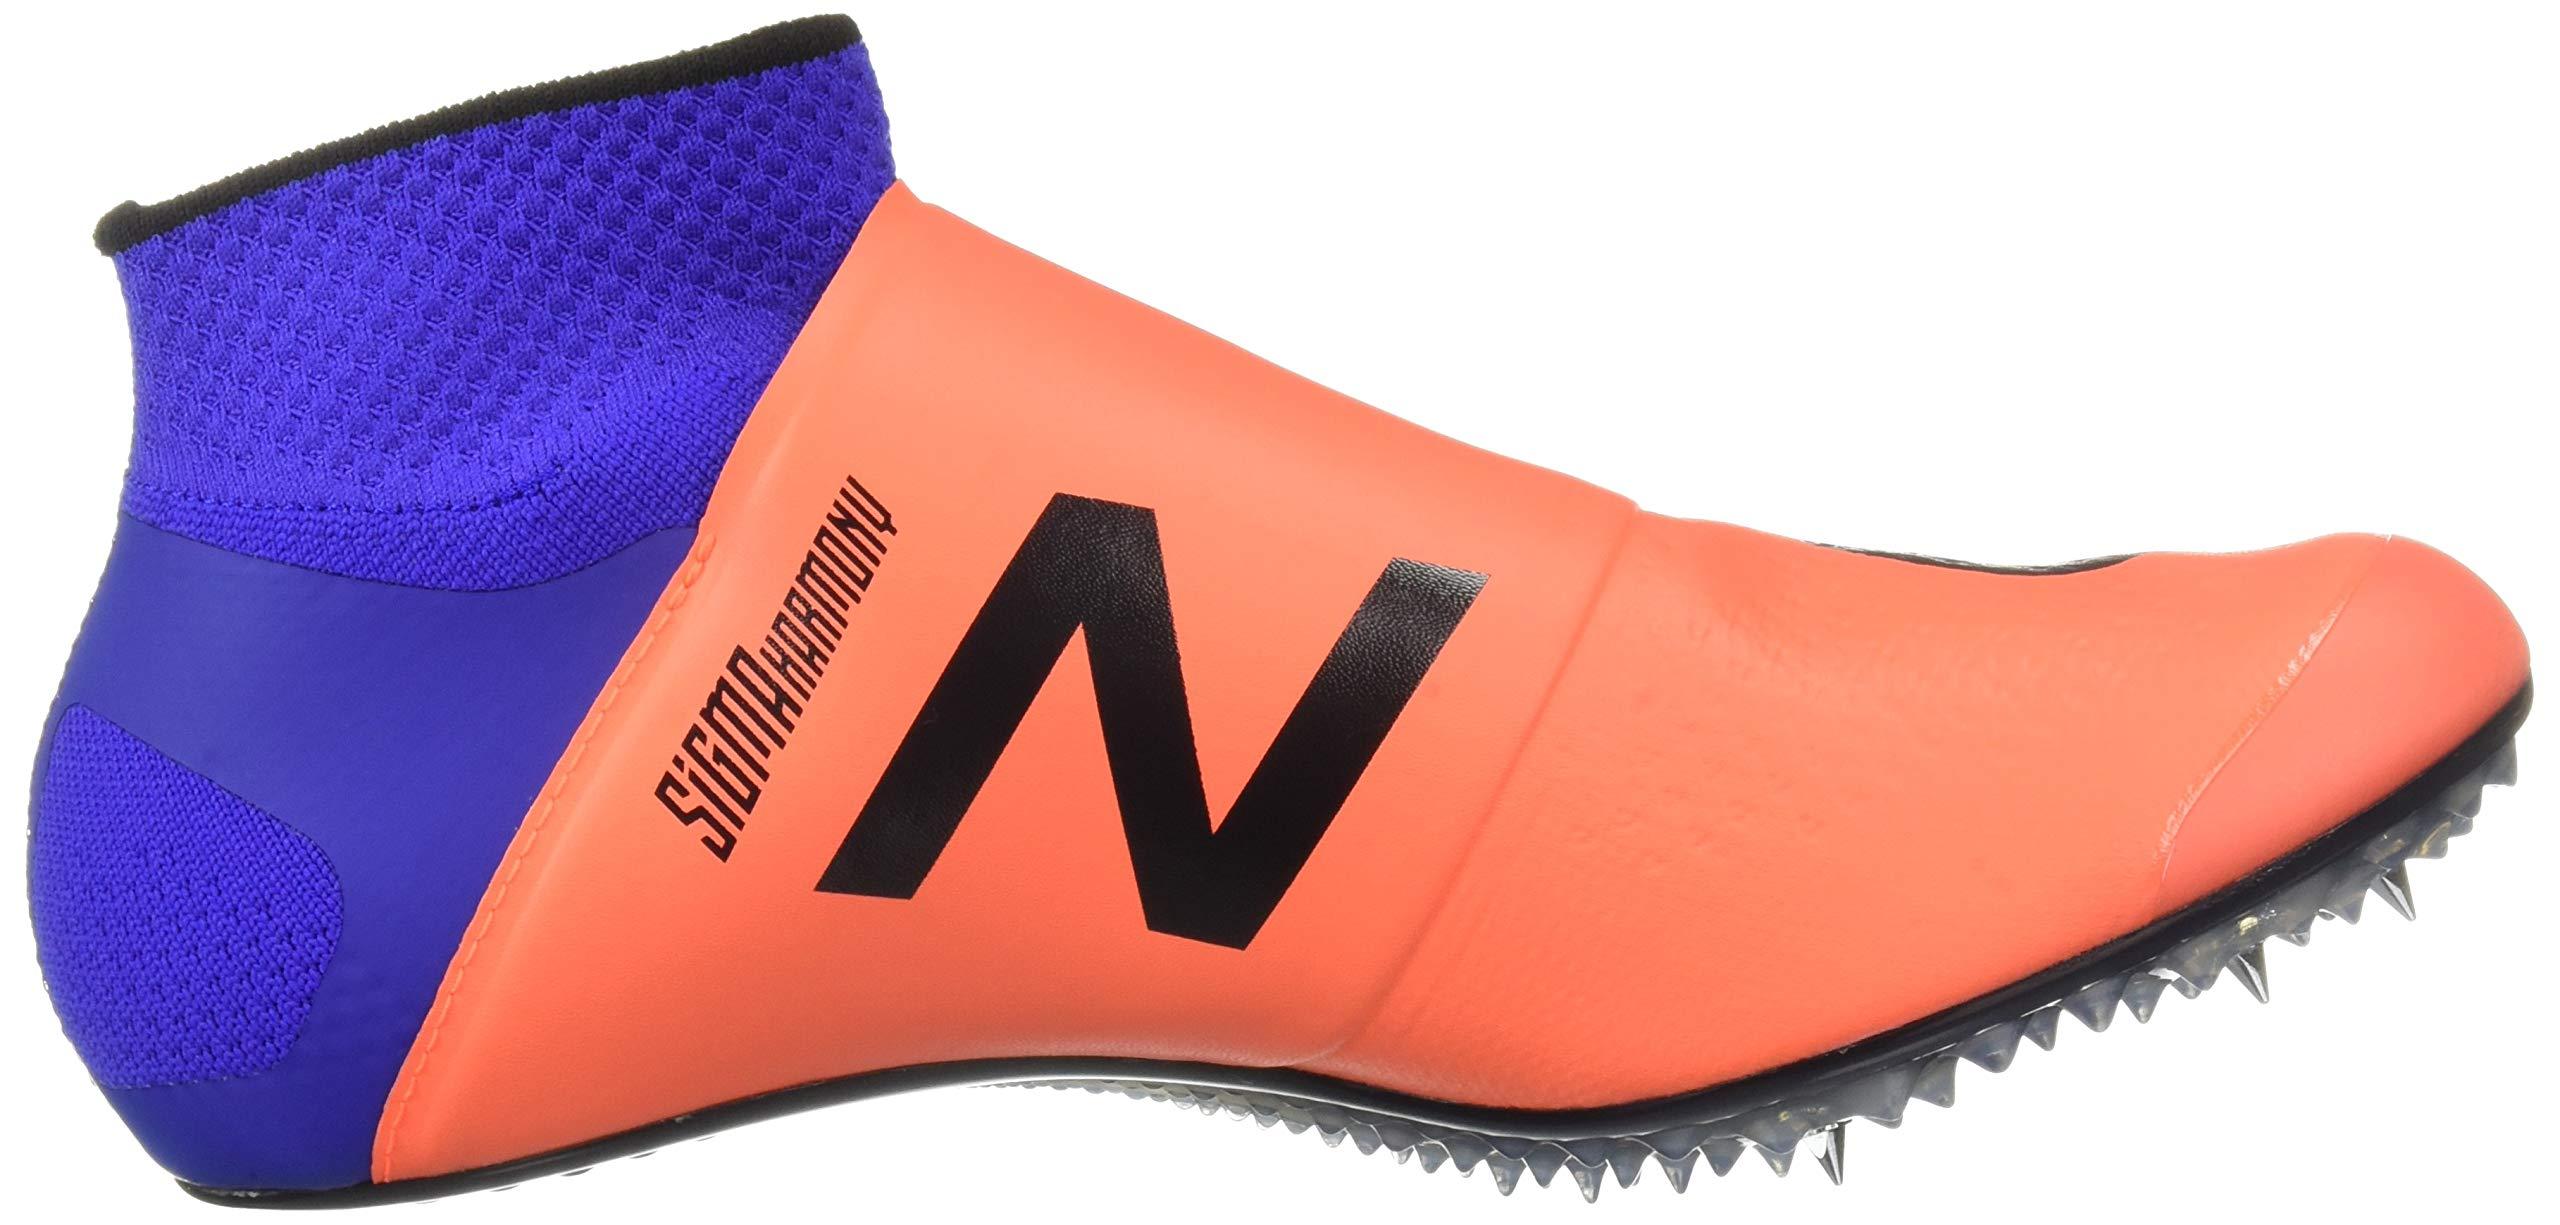 New Balance Men's Sigma Harmony Vazee Track Shoe Dark Mango/uv Blue 5 D US by New Balance (Image #7)